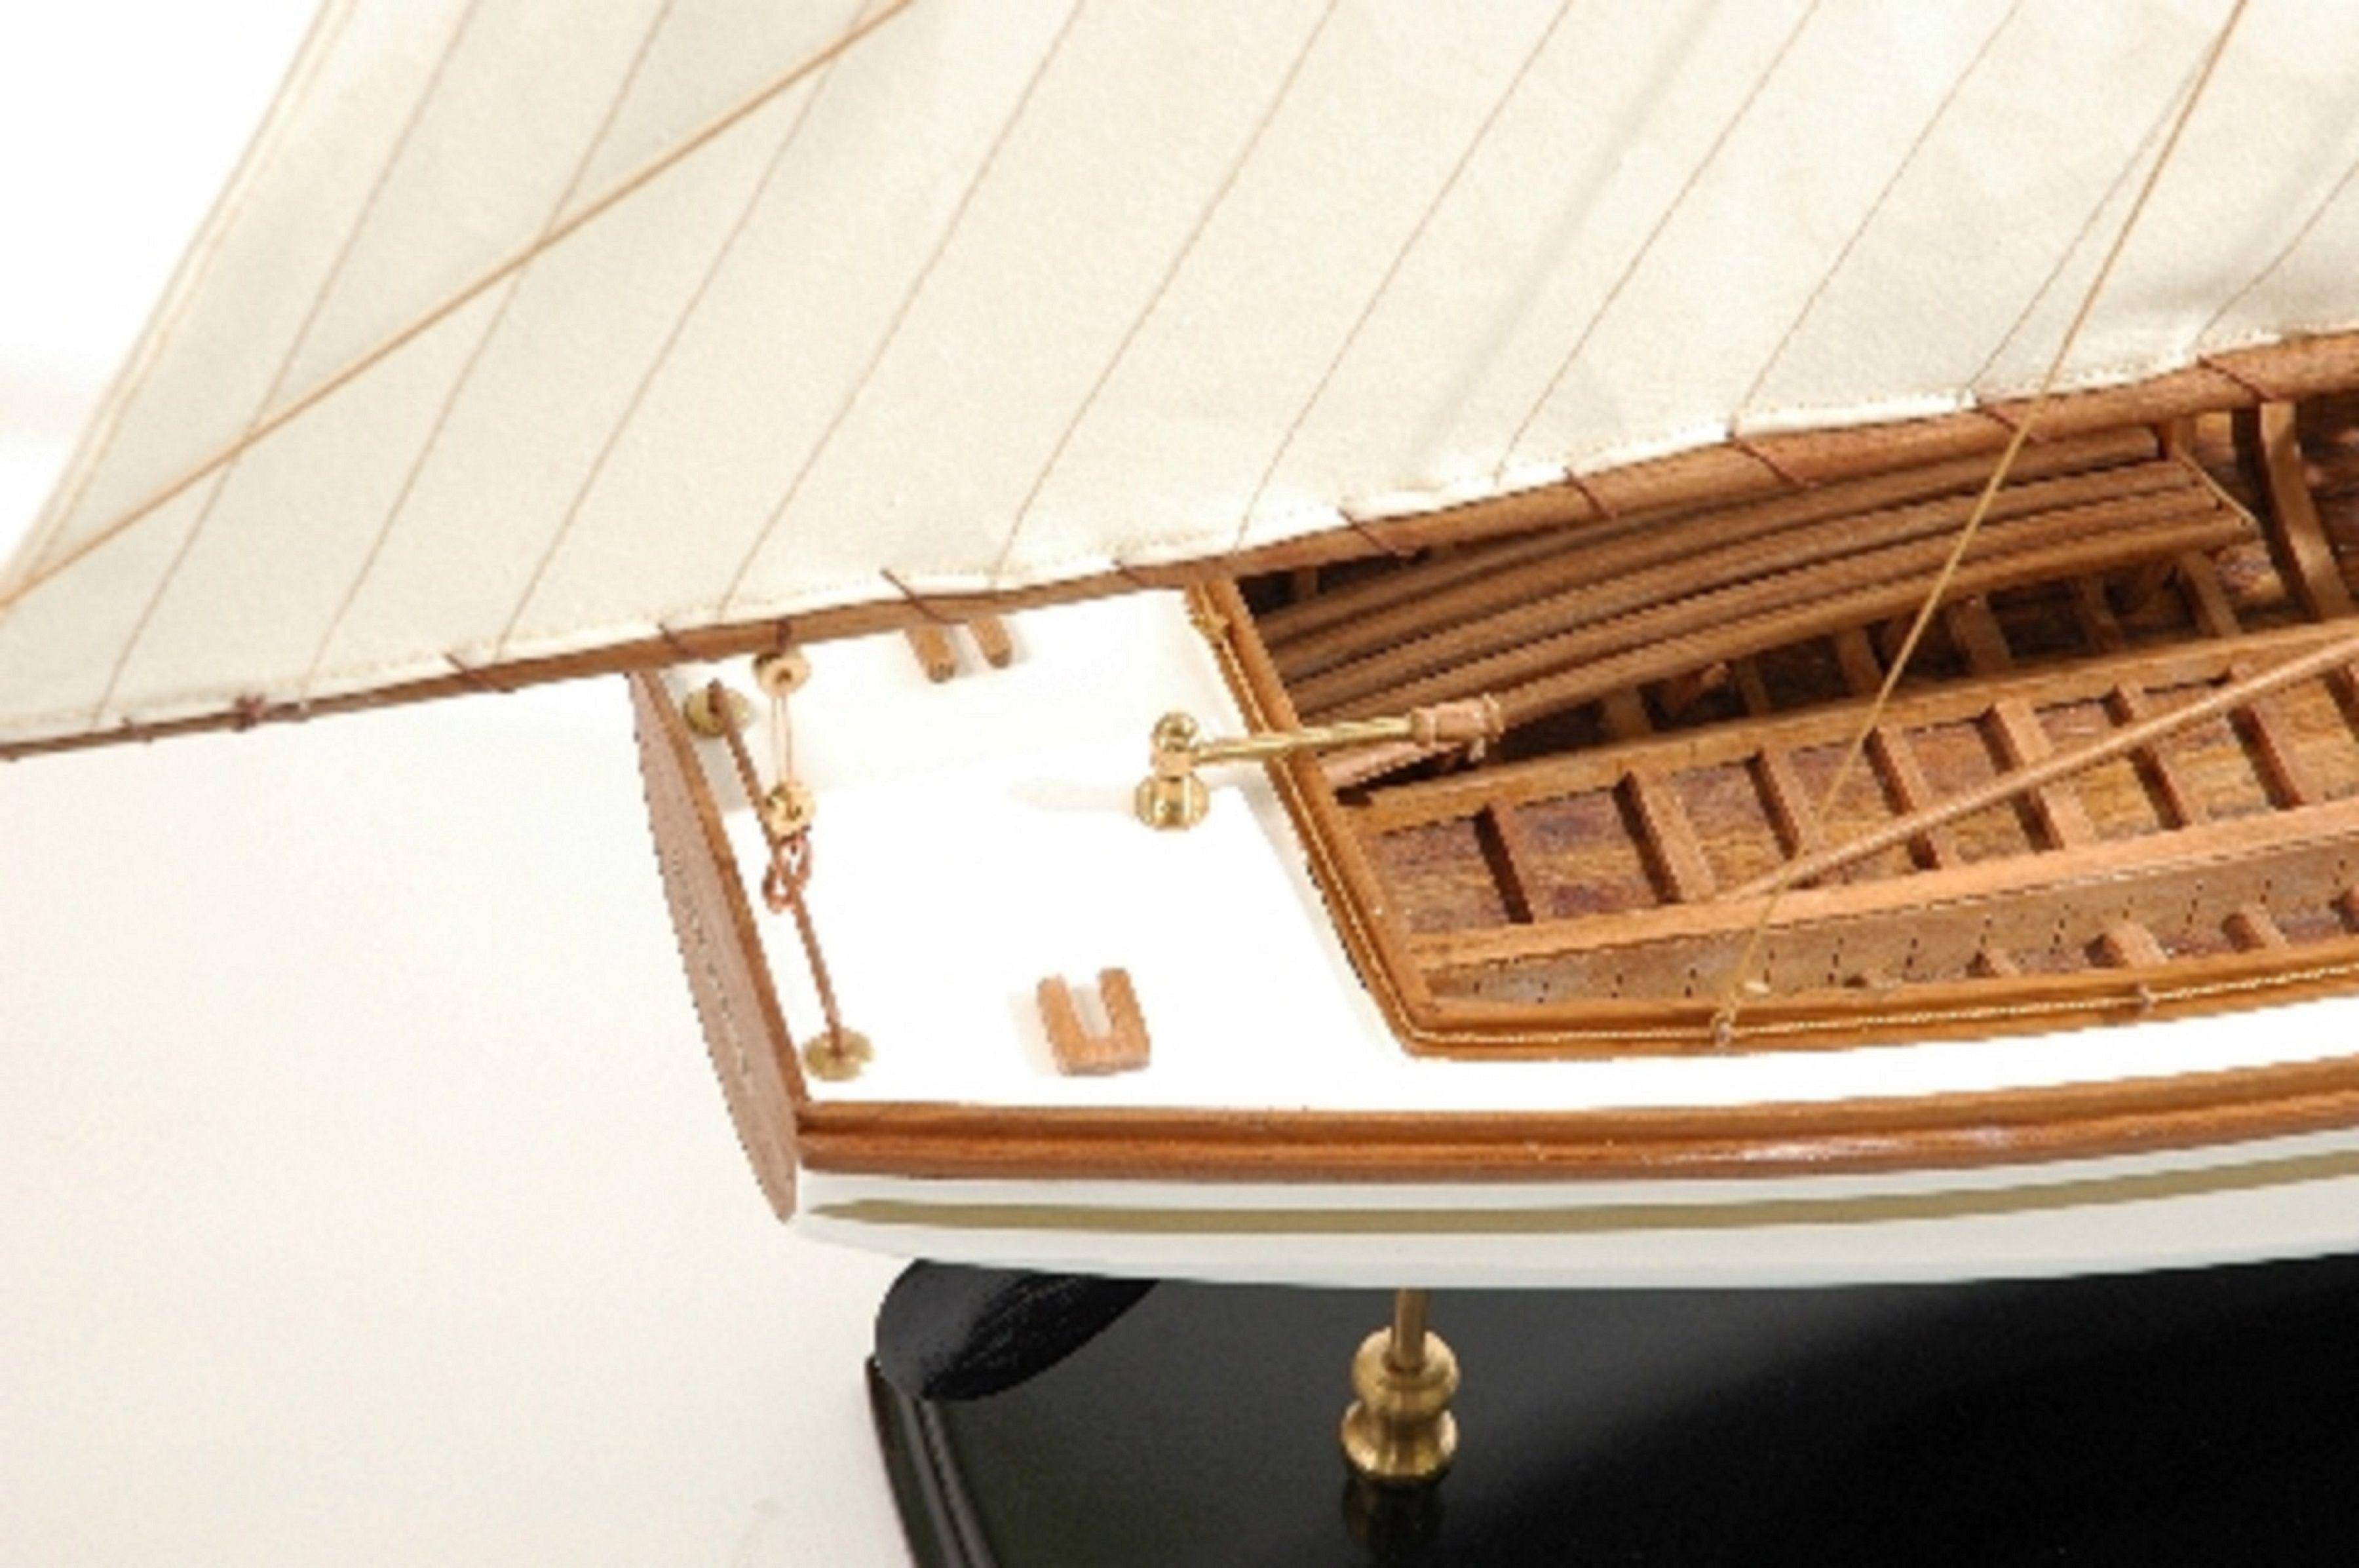 166-8434-Yare-Bure-Model-Yacht-Superior-Range